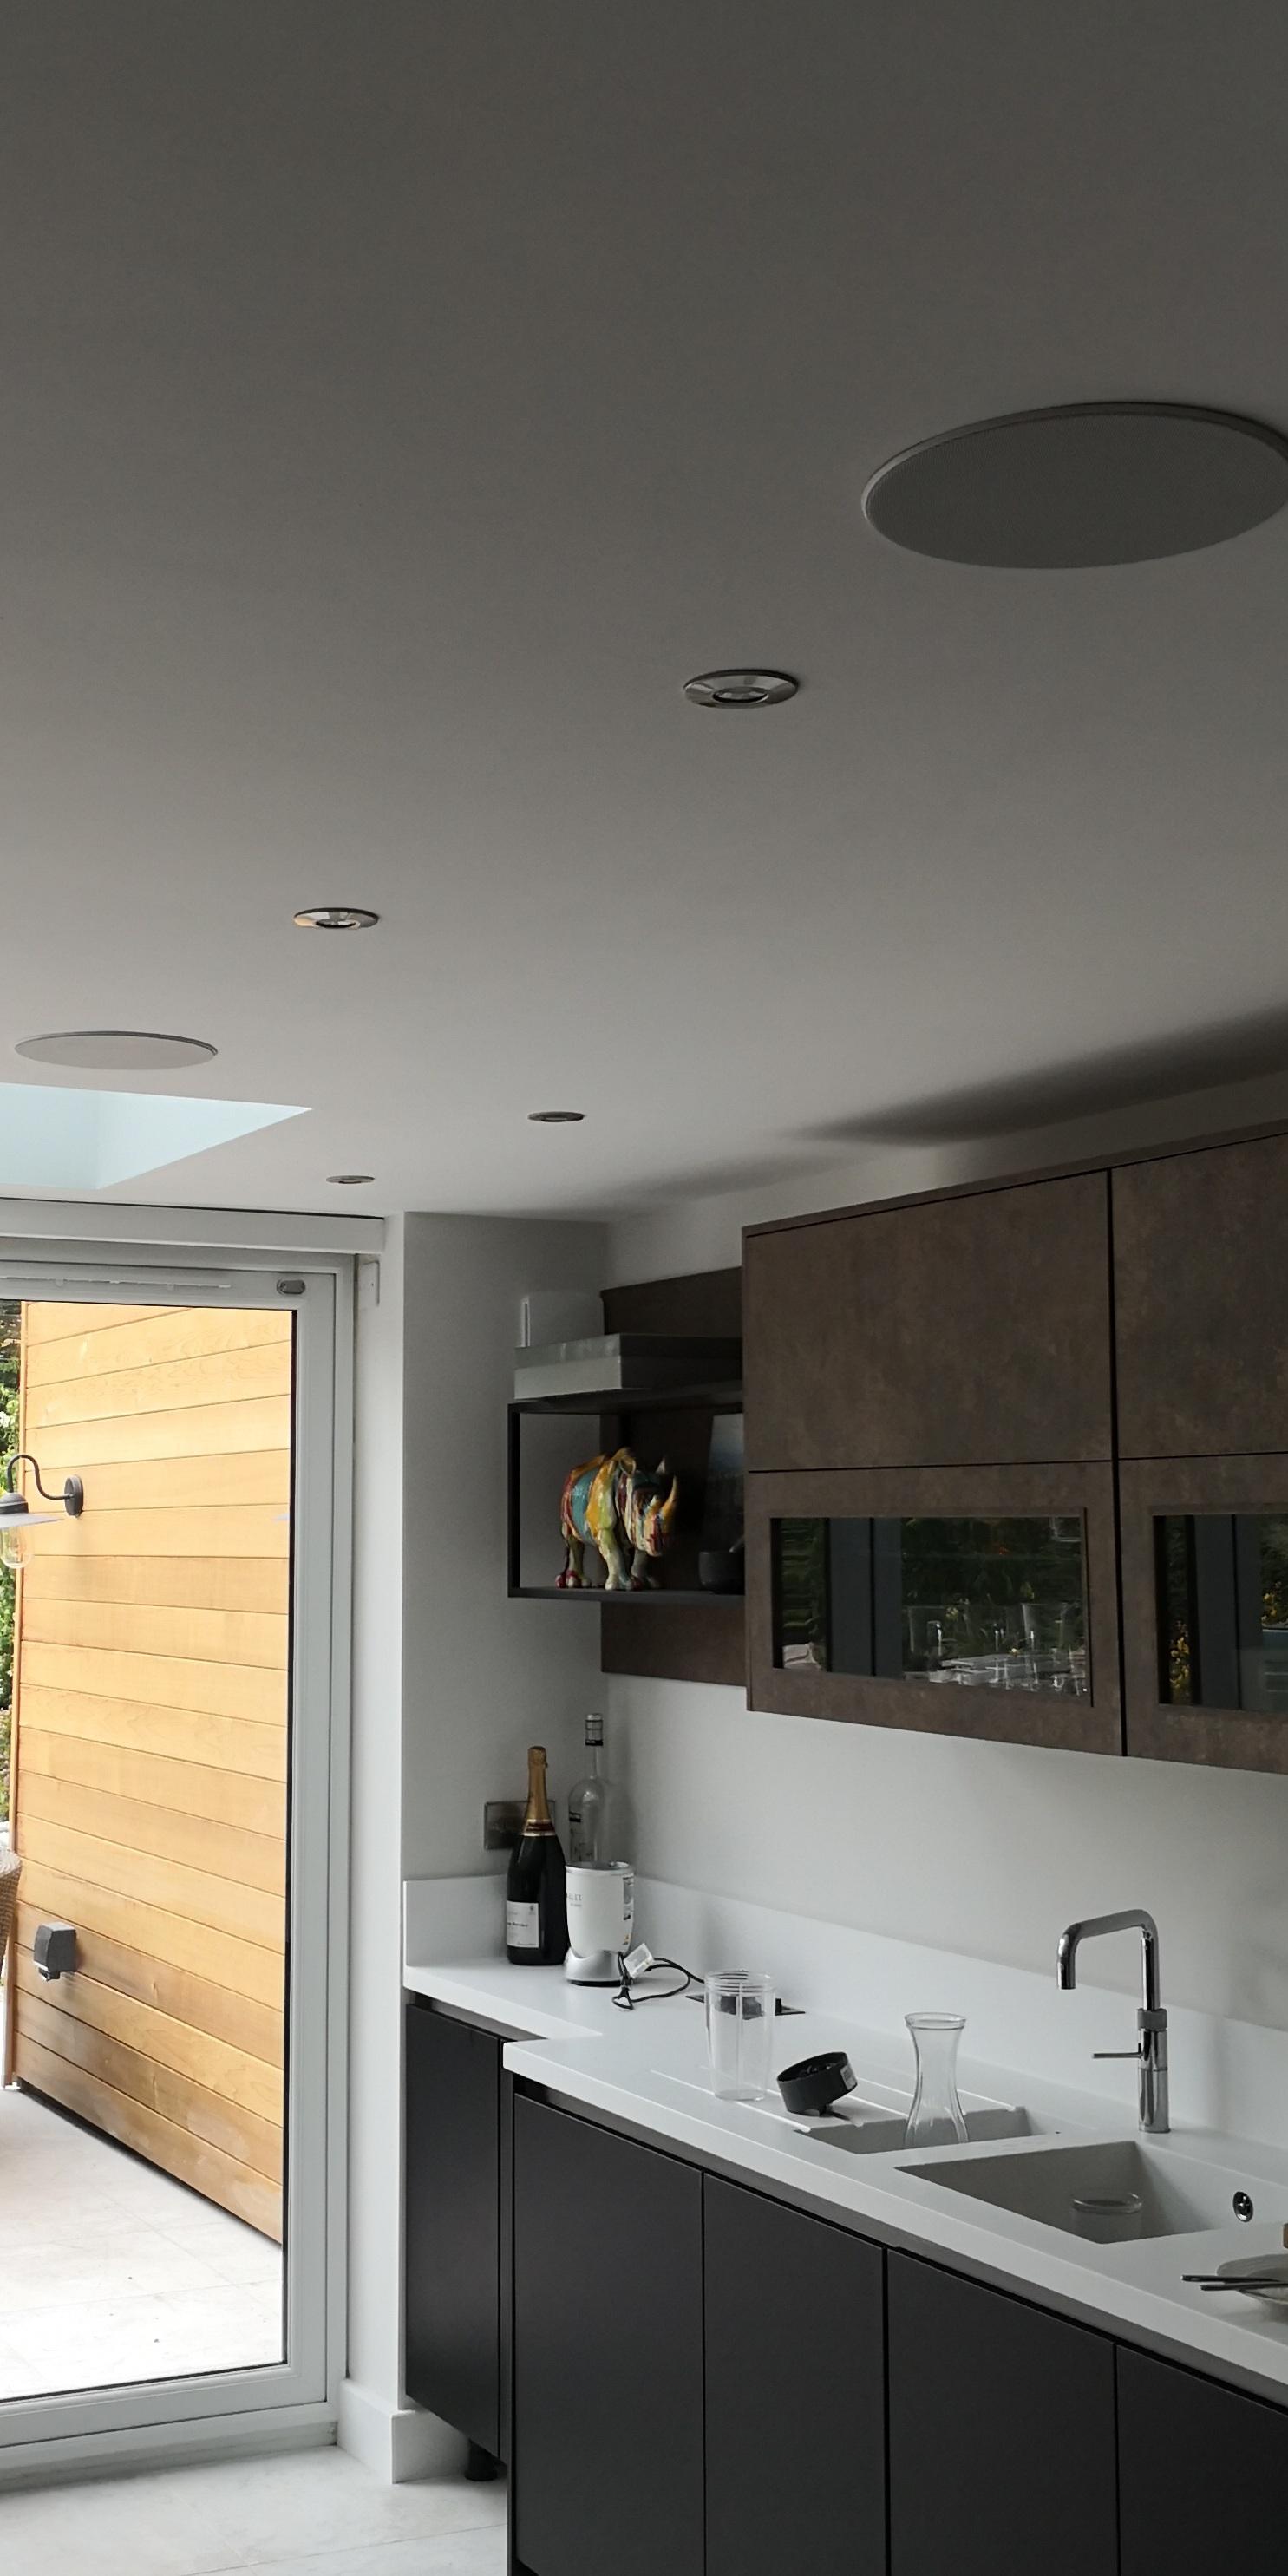 Kitchen speakers